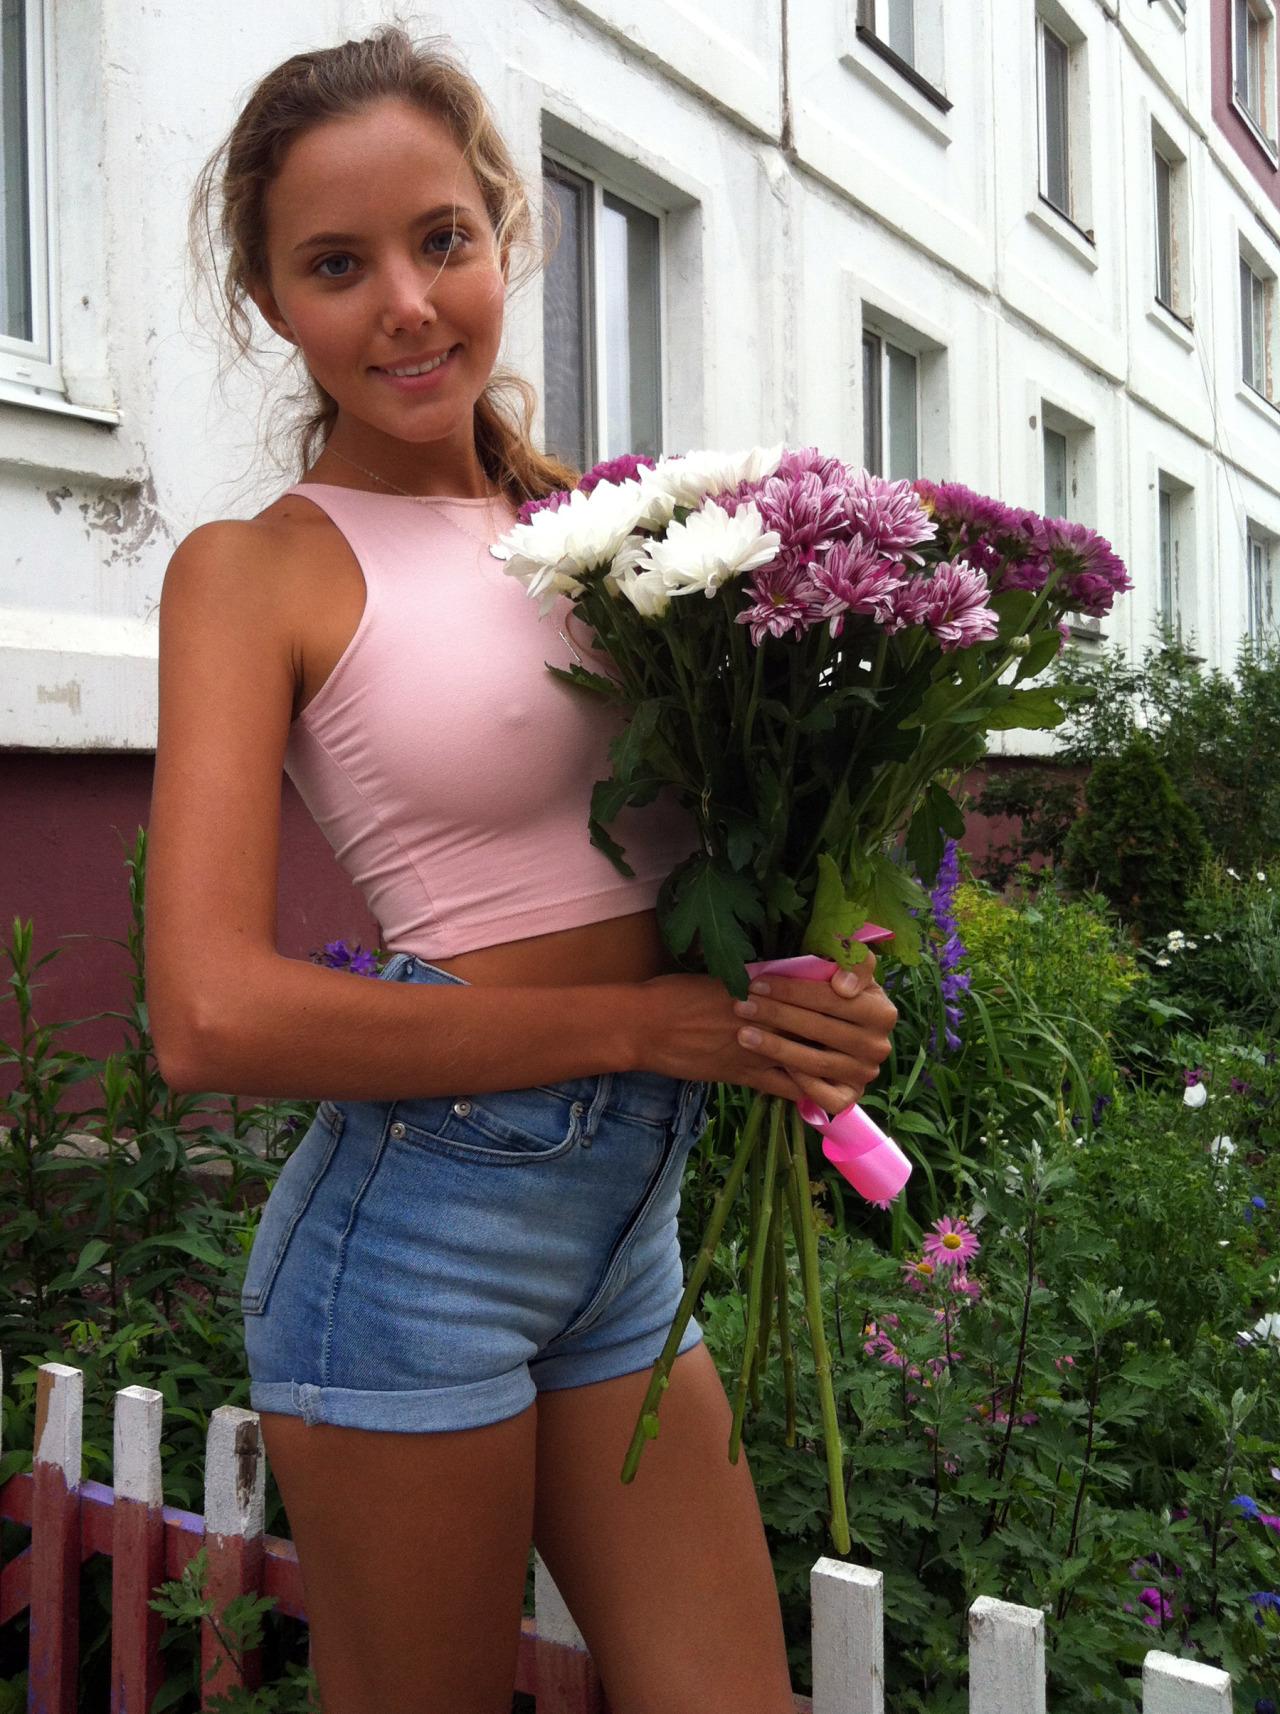 sensual encounterjonni hennessy dane cross part #wetskin #wethair #blonde #outdoors #amateur #demin #denimjeans #seethru #nobra #sexybabe #tits #nipples #blueeyes #paleskin #thin